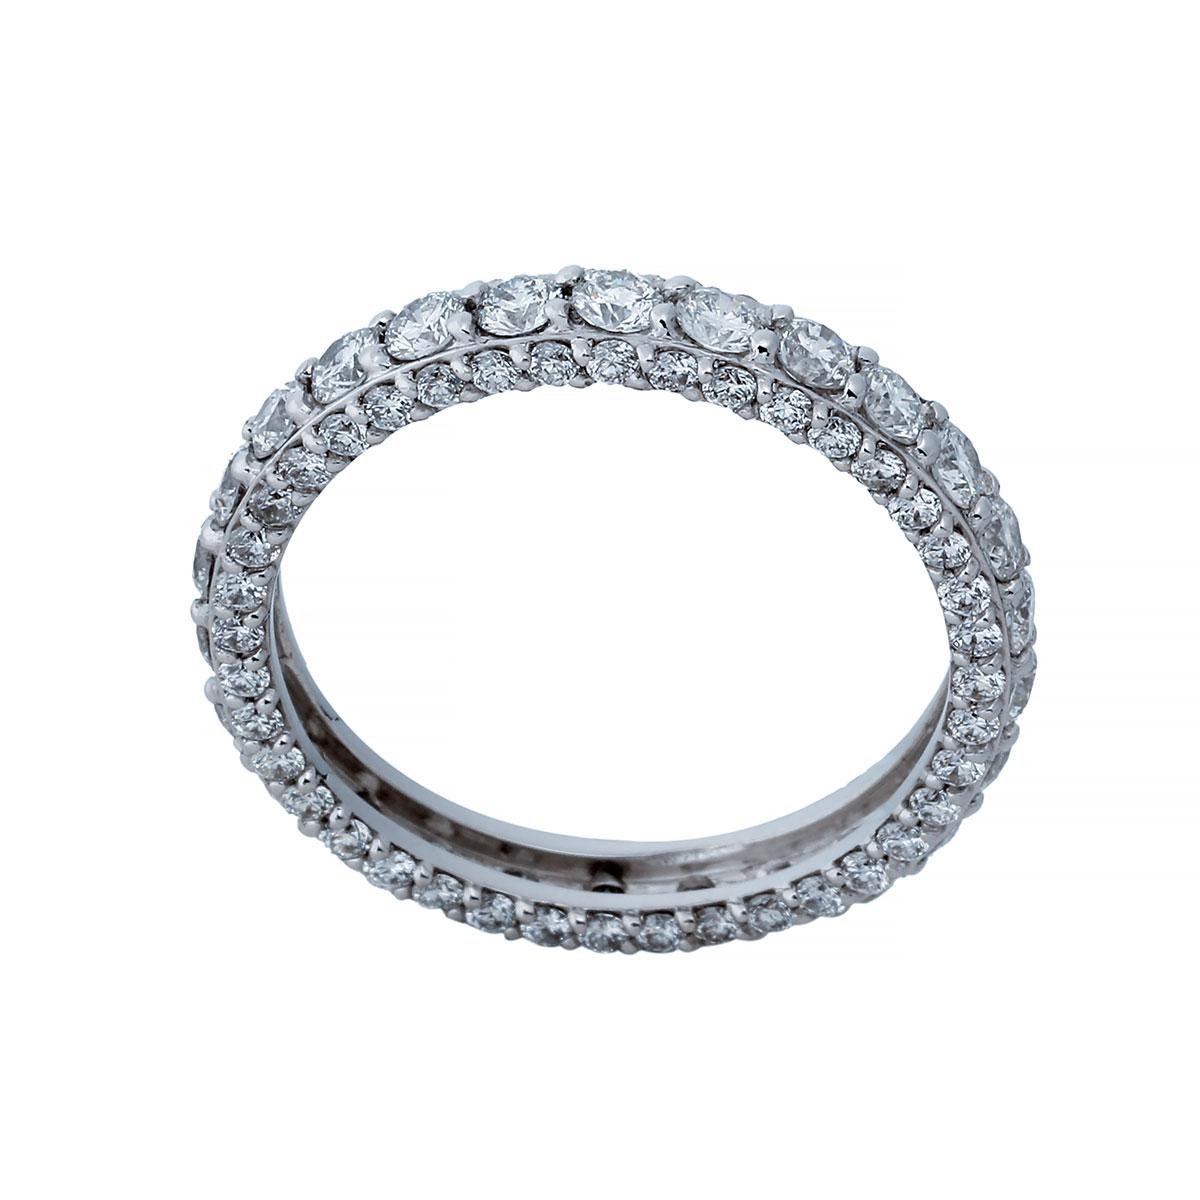 حلقه برليان 75035 C گوهربين goharbin